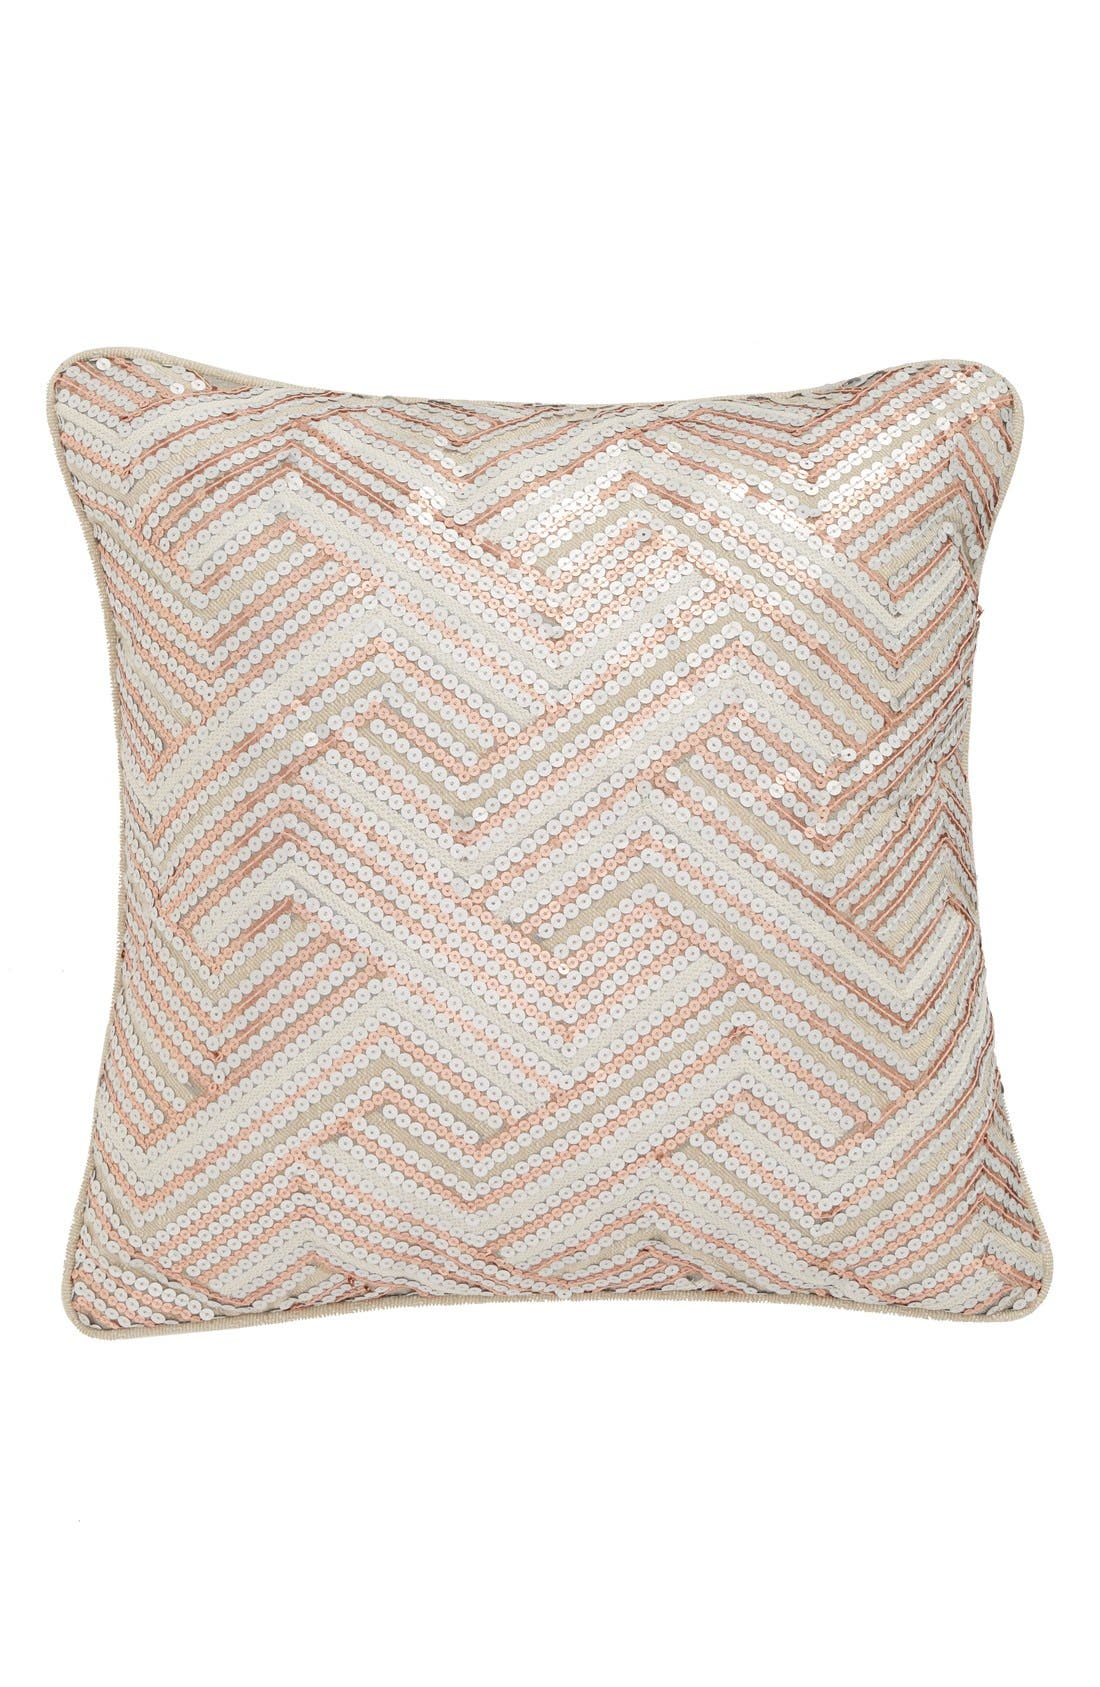 VILLA HOME COLLECTION,                             'Lona' Sequin Accent Pillow,                             Main thumbnail 1, color,                             650